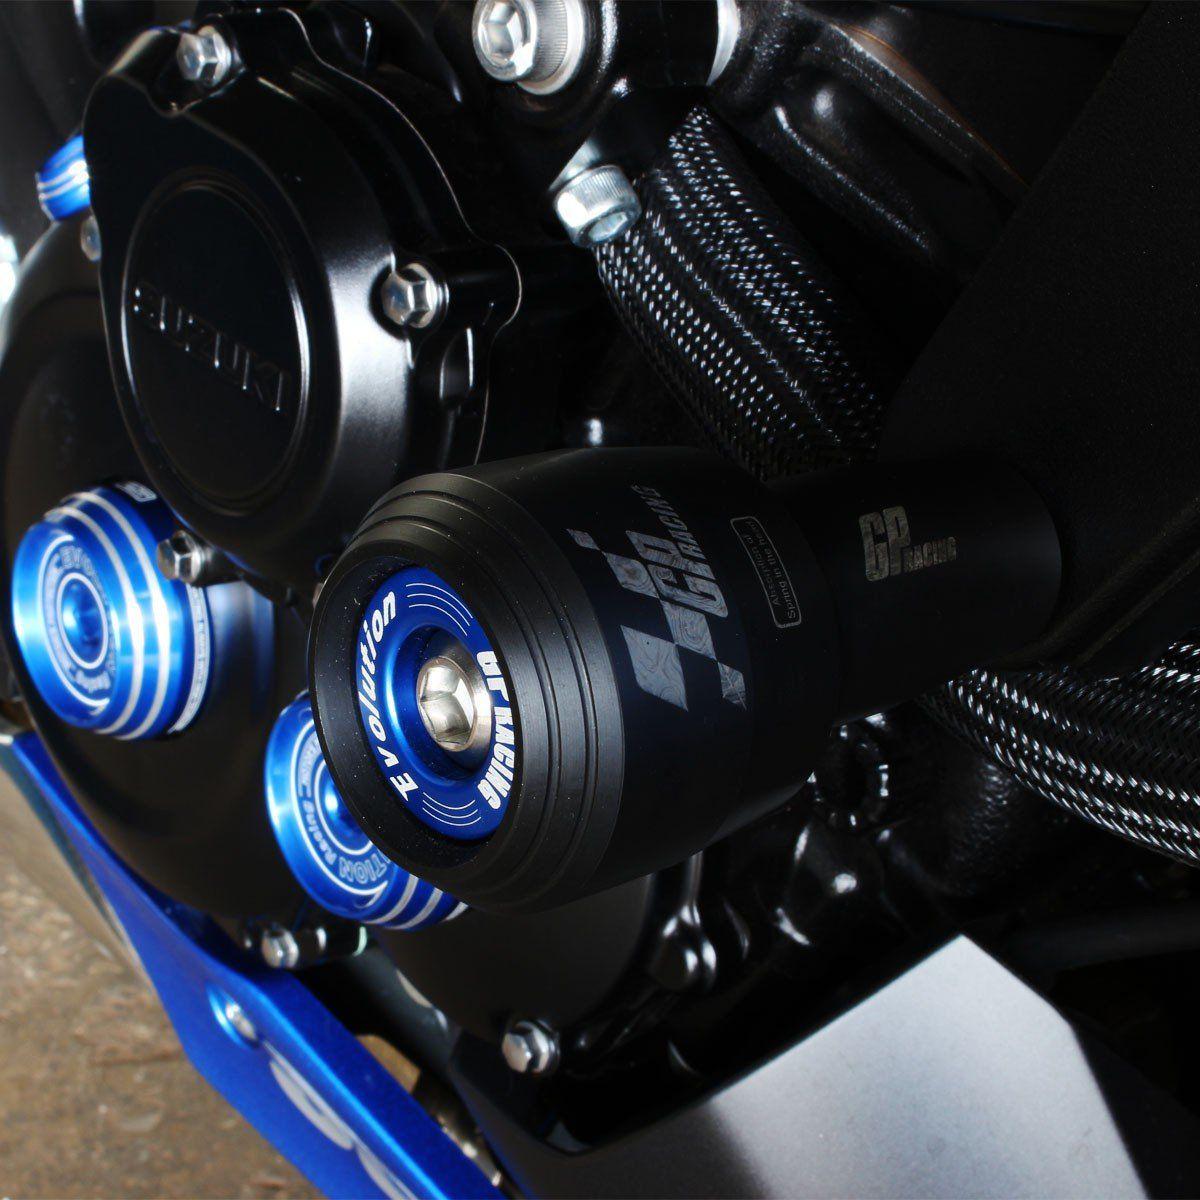 Slider BMW S1000RR 1000 S 1000RR 2012/2015